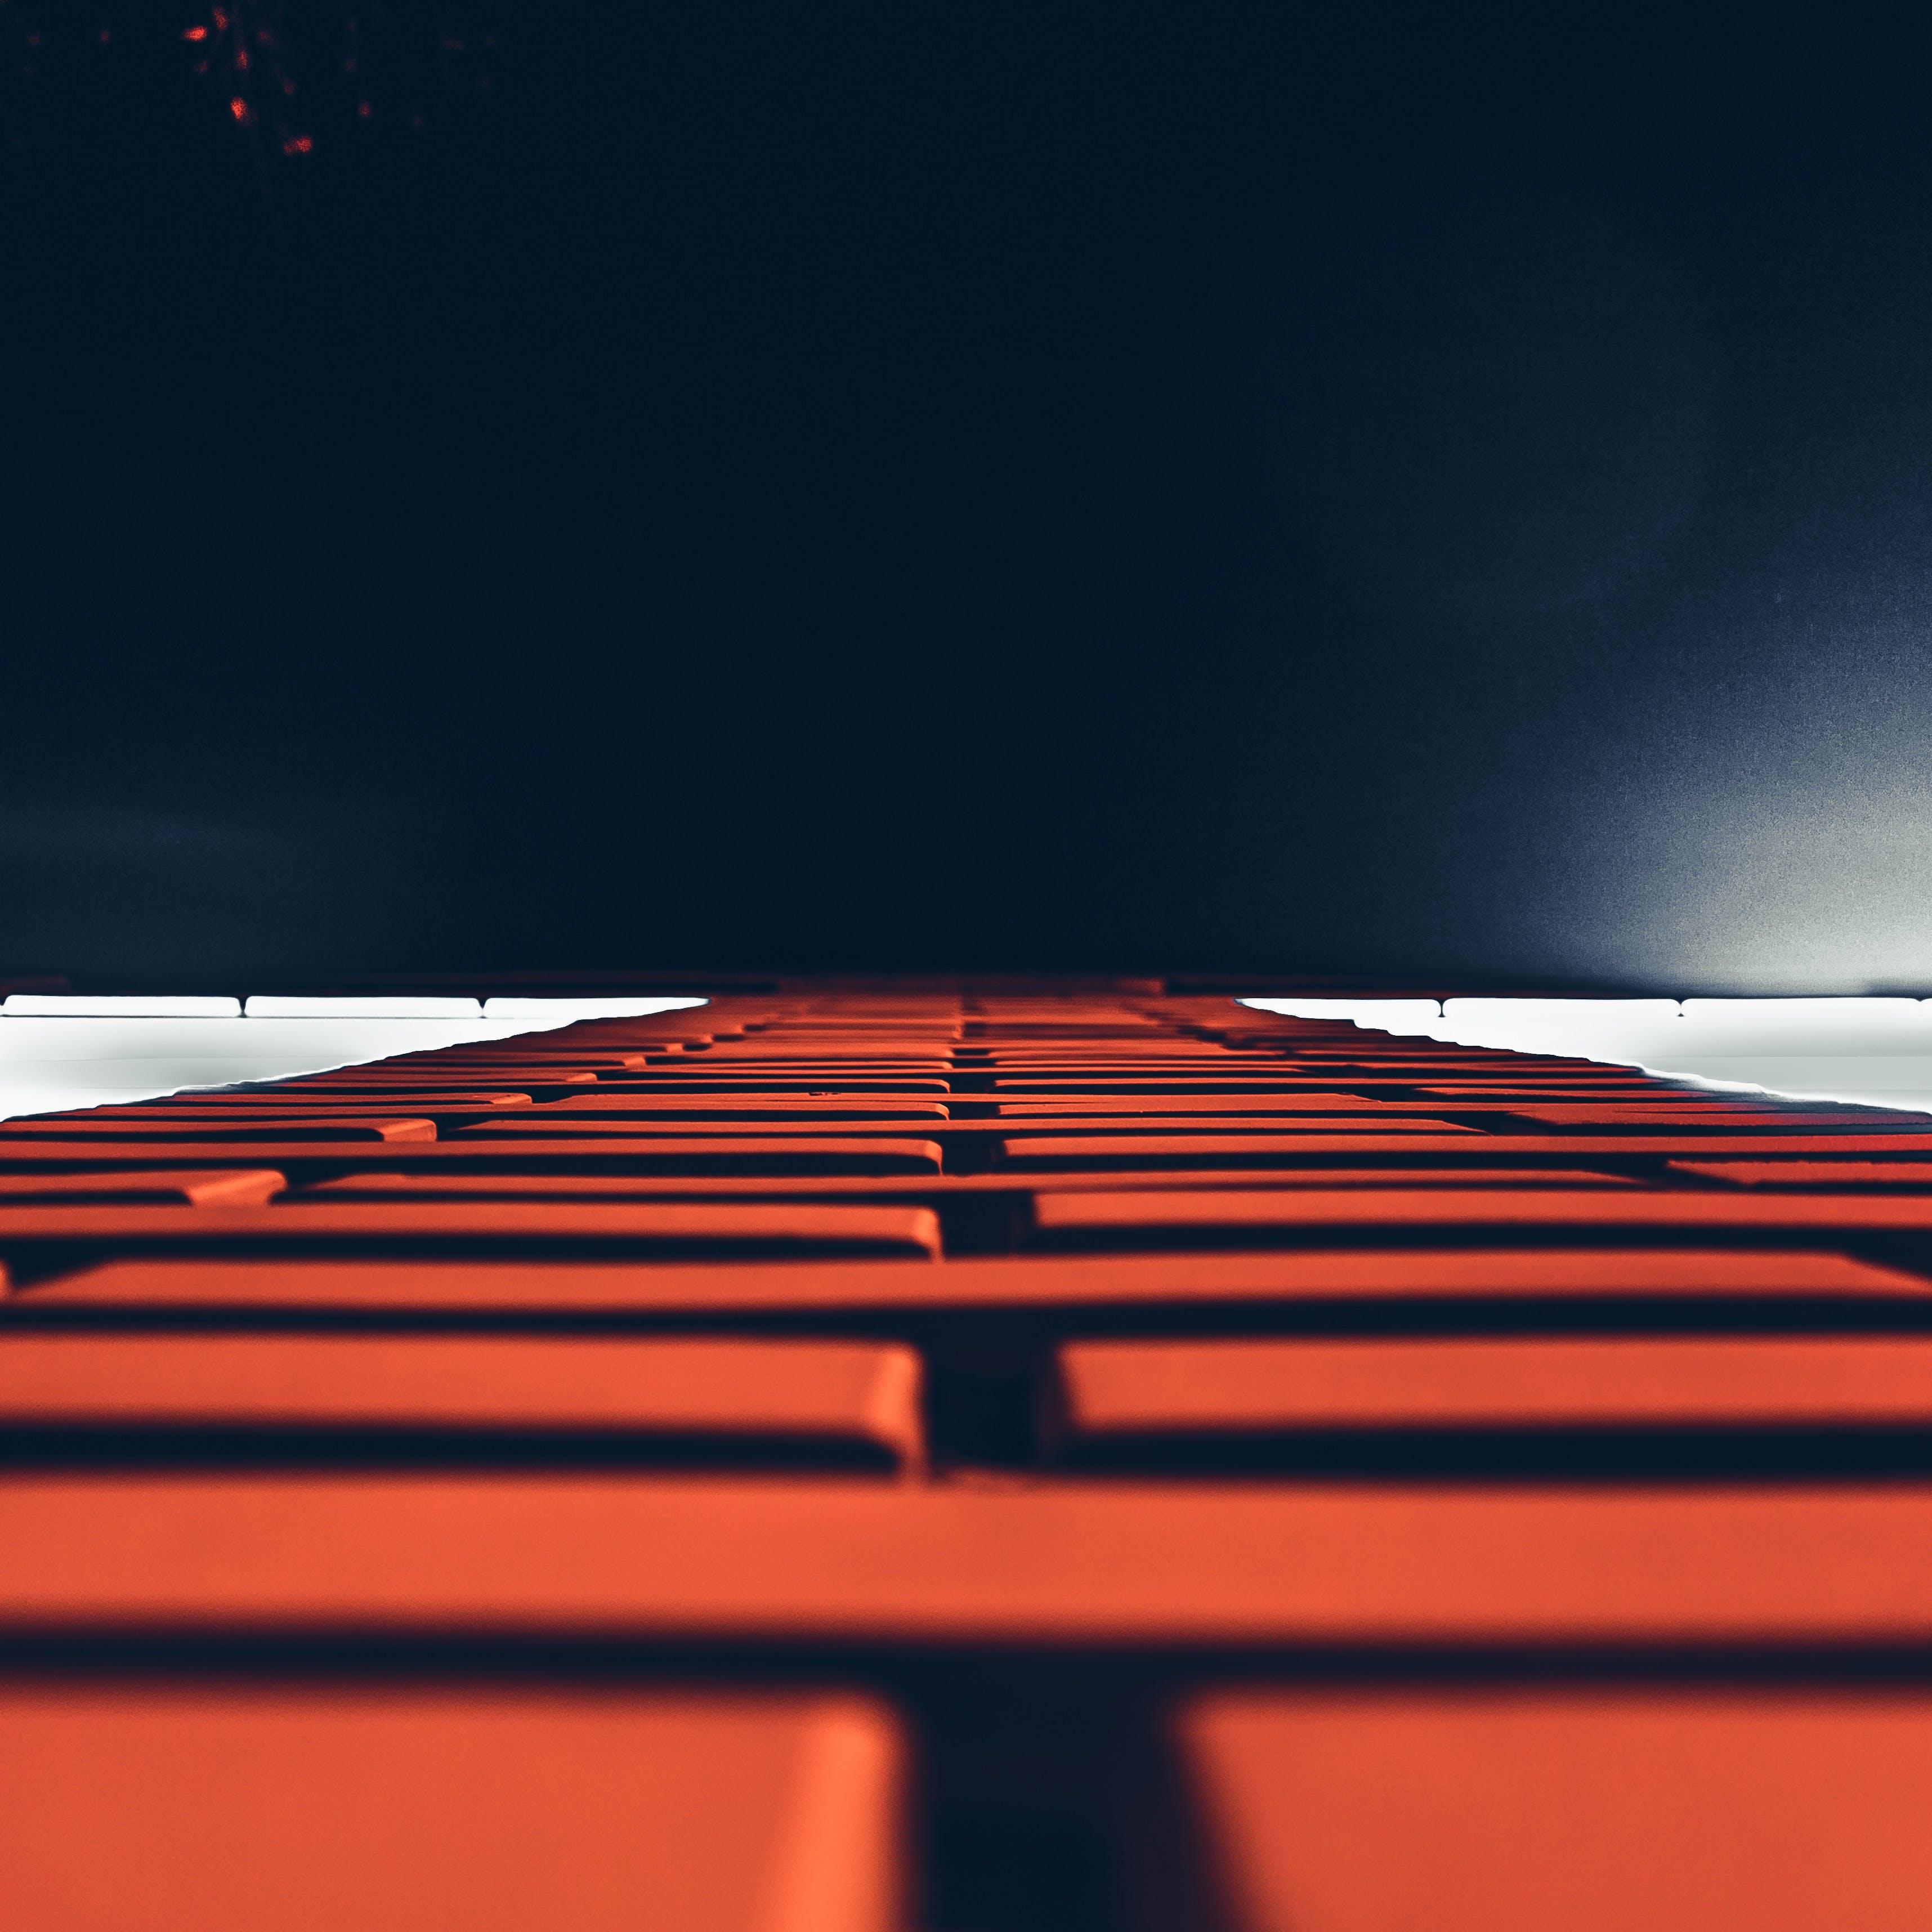 of bricks, brickwork, close-up, dark